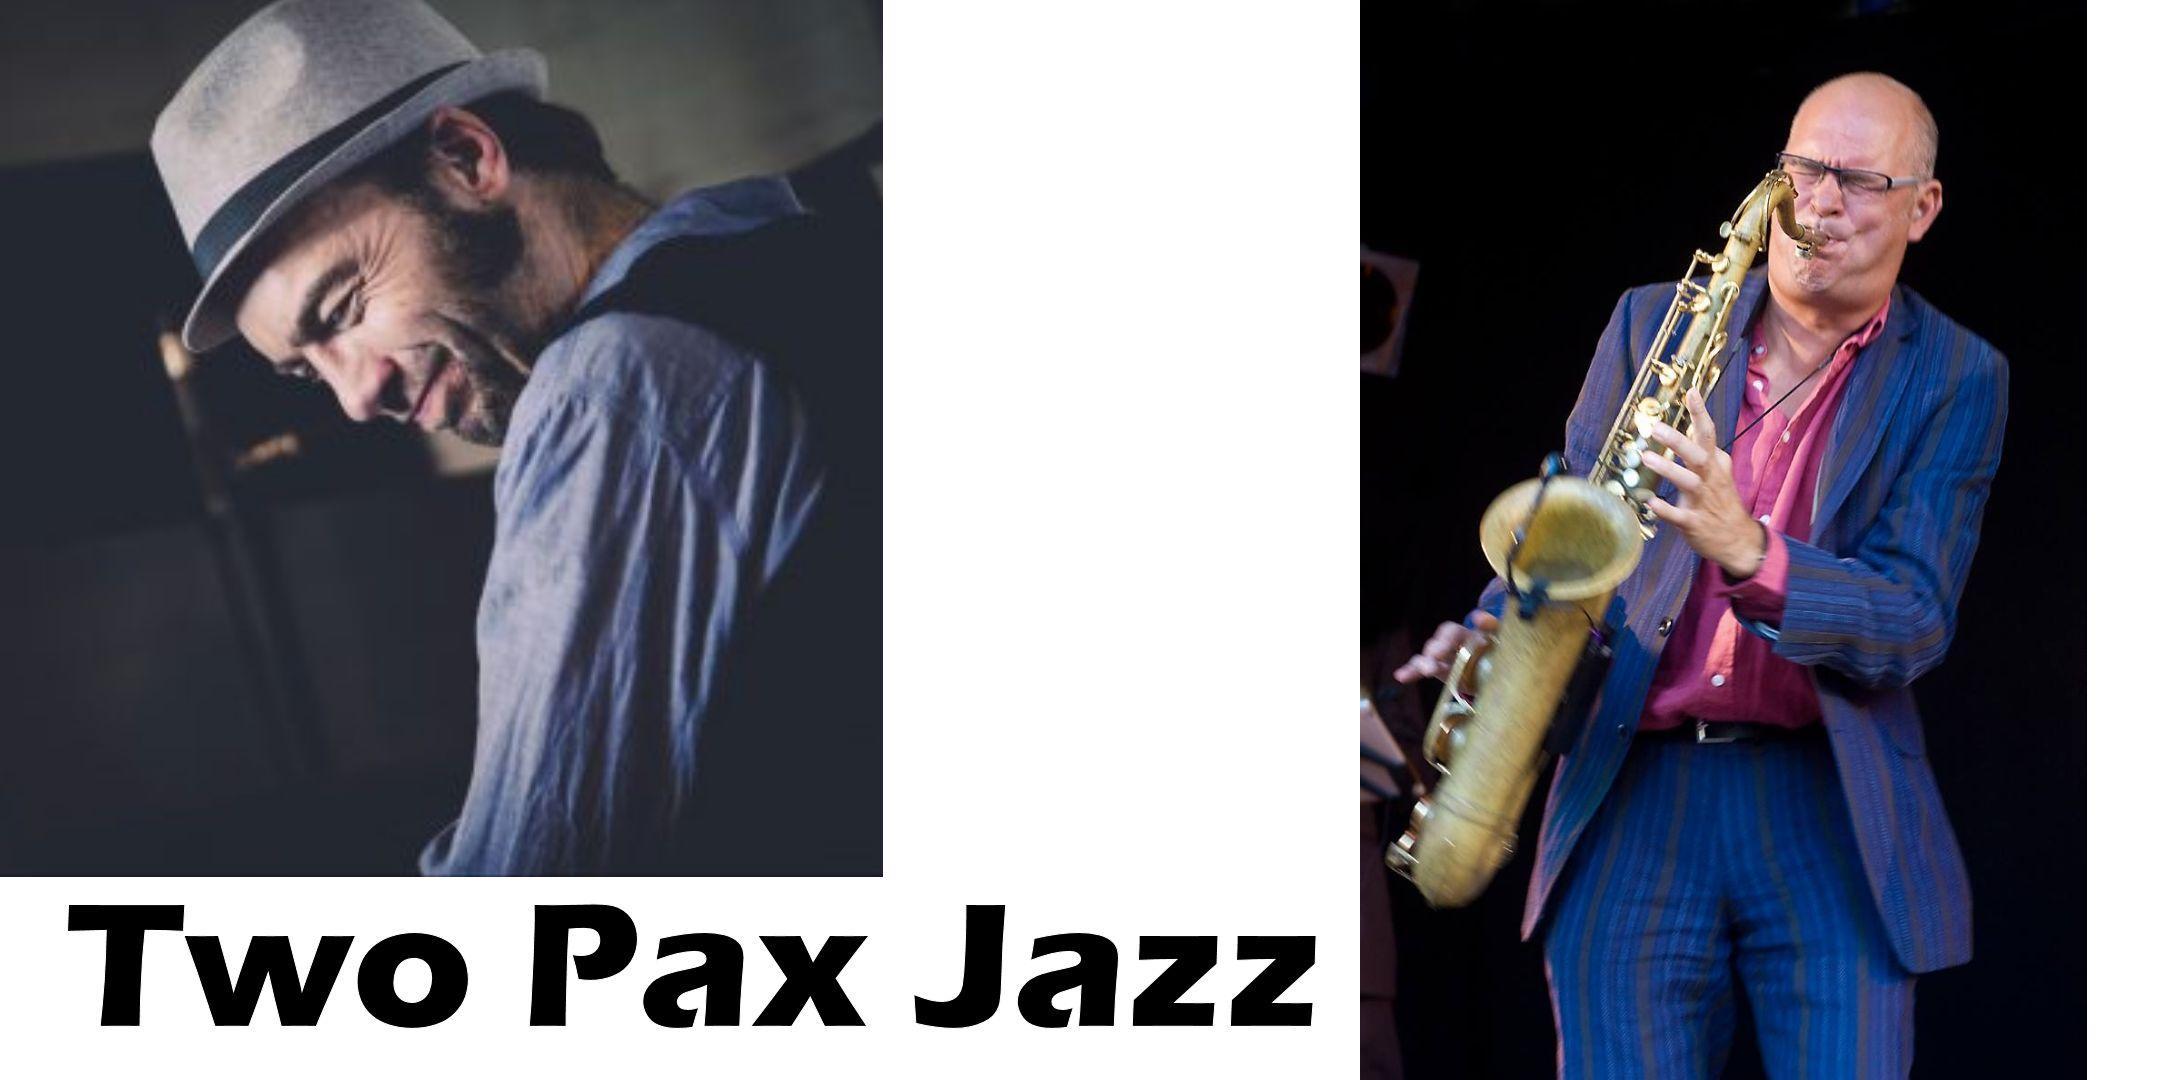 Hans Wijnbergen en Jasper Blokzijl: Two Pax J